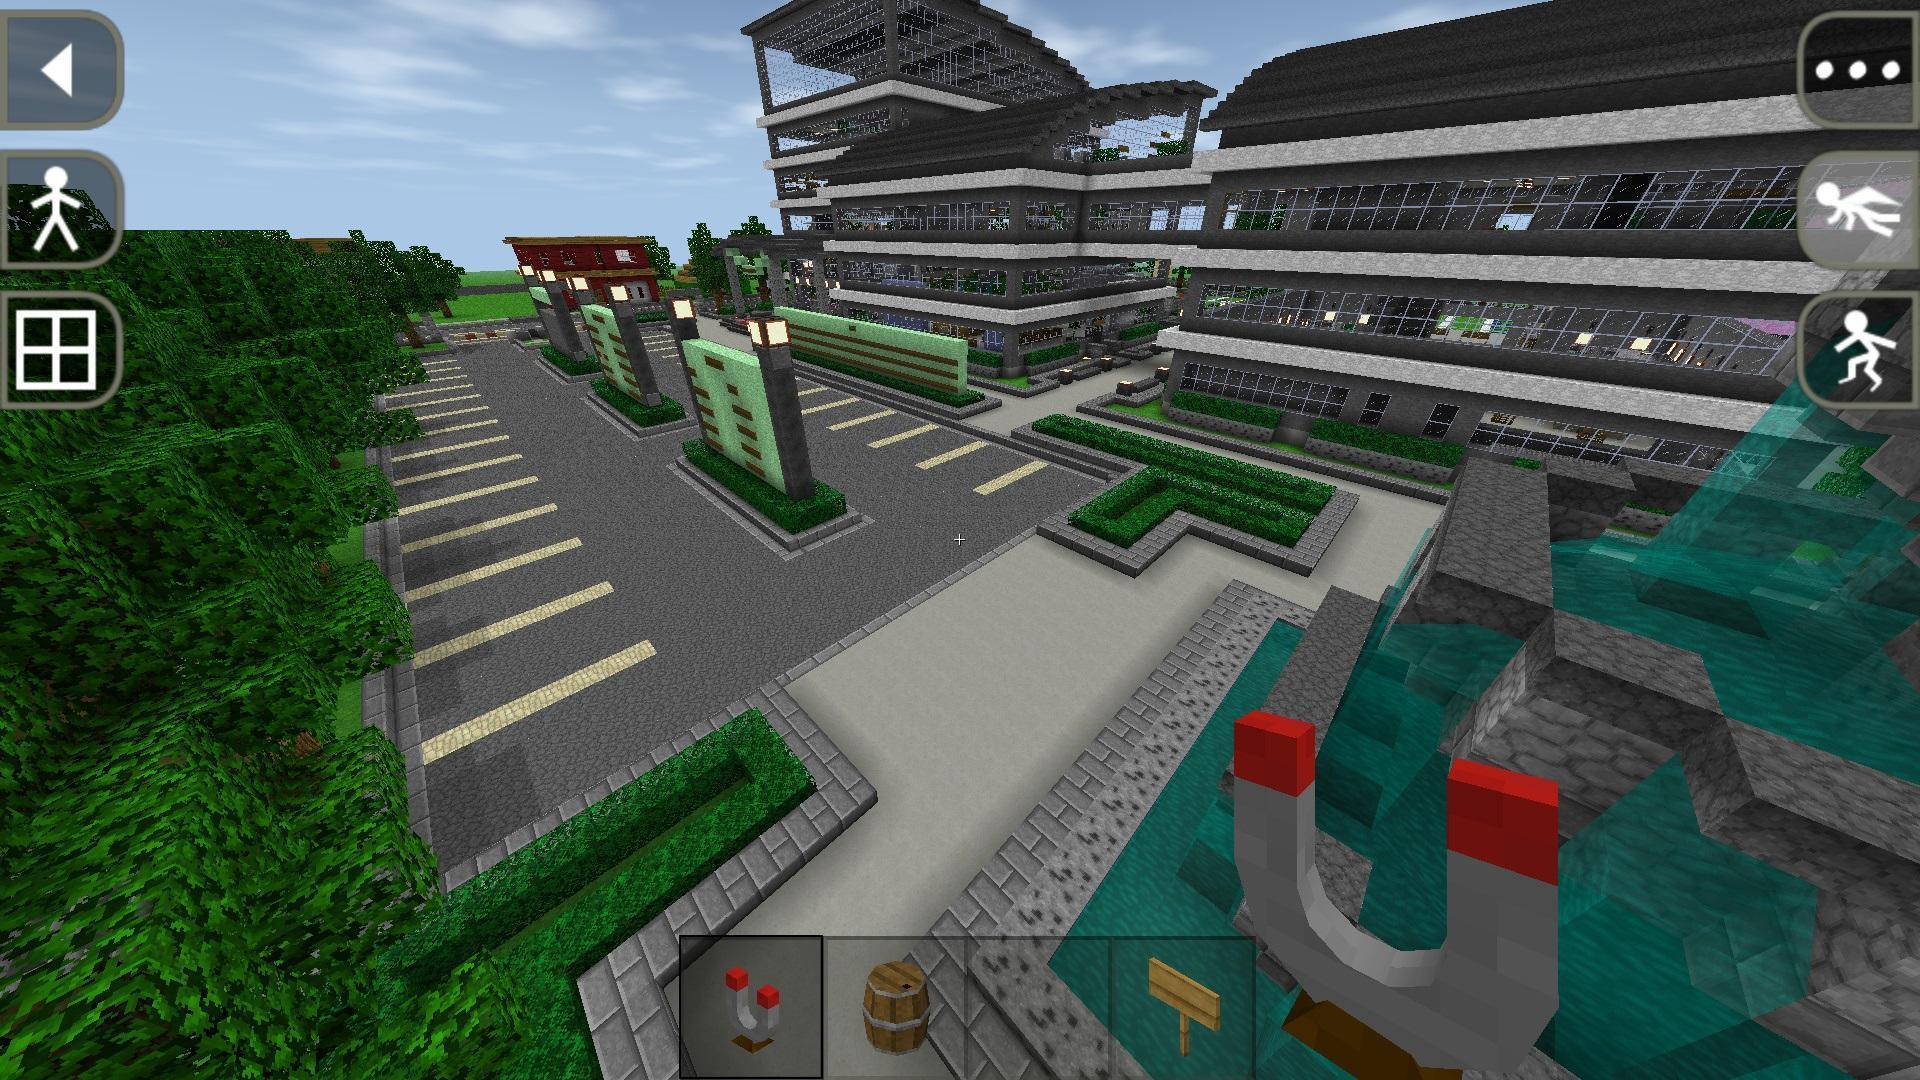 Survivalcraft Demo 1.29.54.0 Screenshot 21